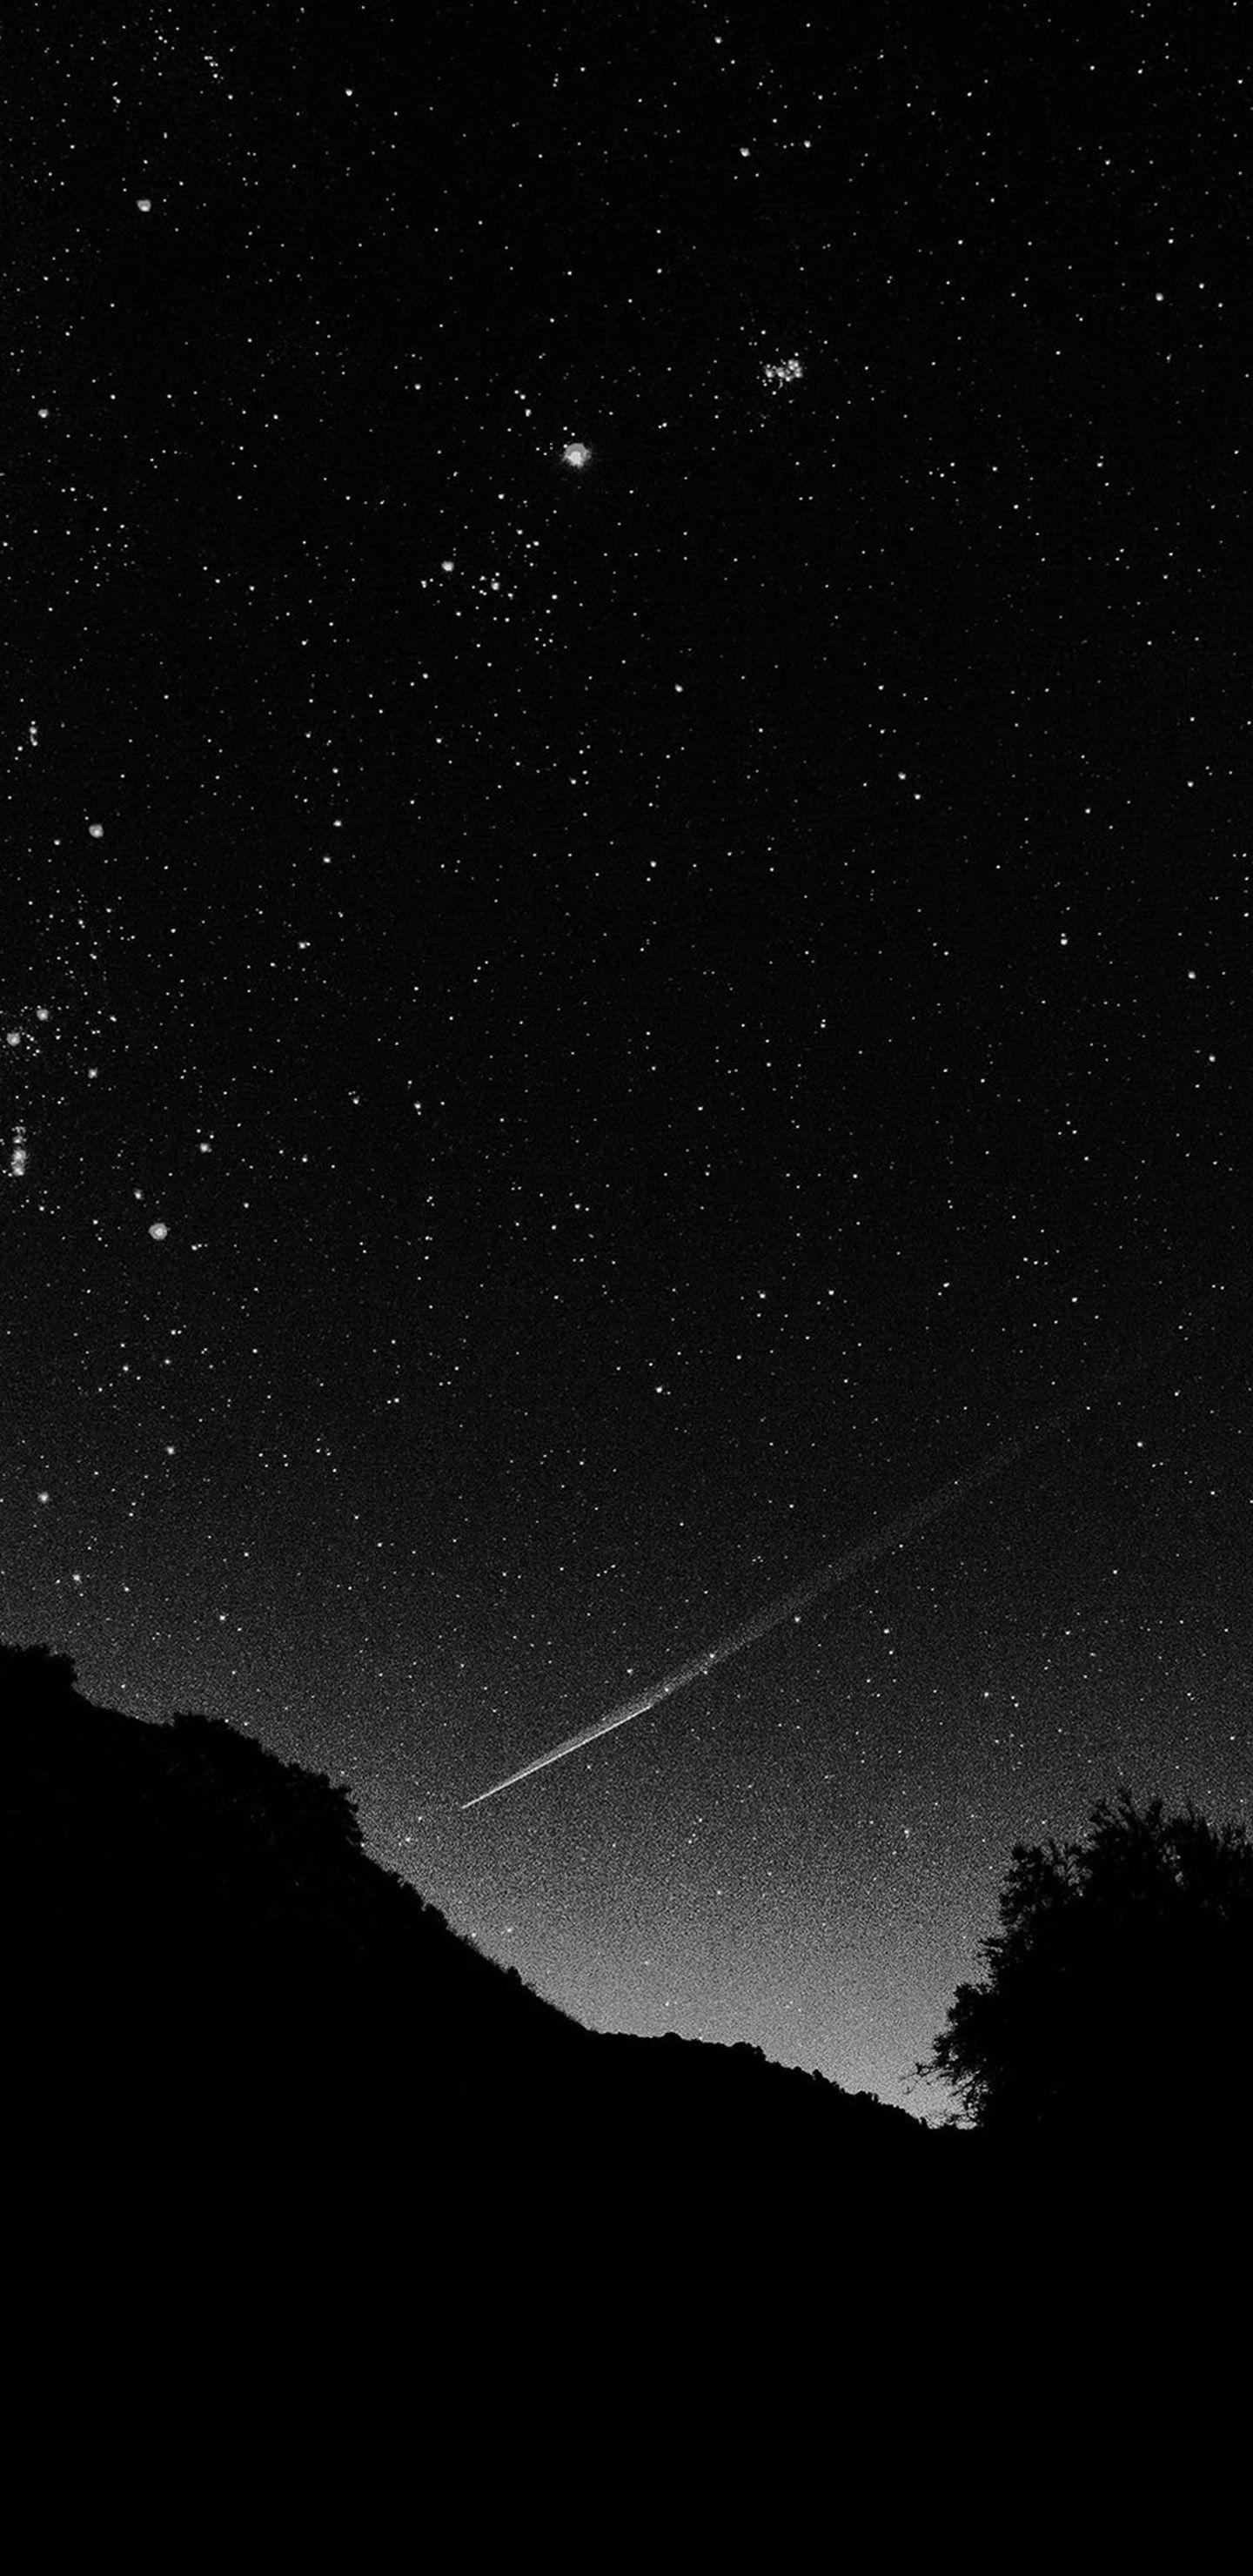 Mg37 Astronomy Space Black Sky Night Beautiful Falling Star Samsung Galaxy Note 9 Wallpapers Hd 1440 X 2 Wallpaper Iphone Hipster Galaxy Wallpaper Langit Malam